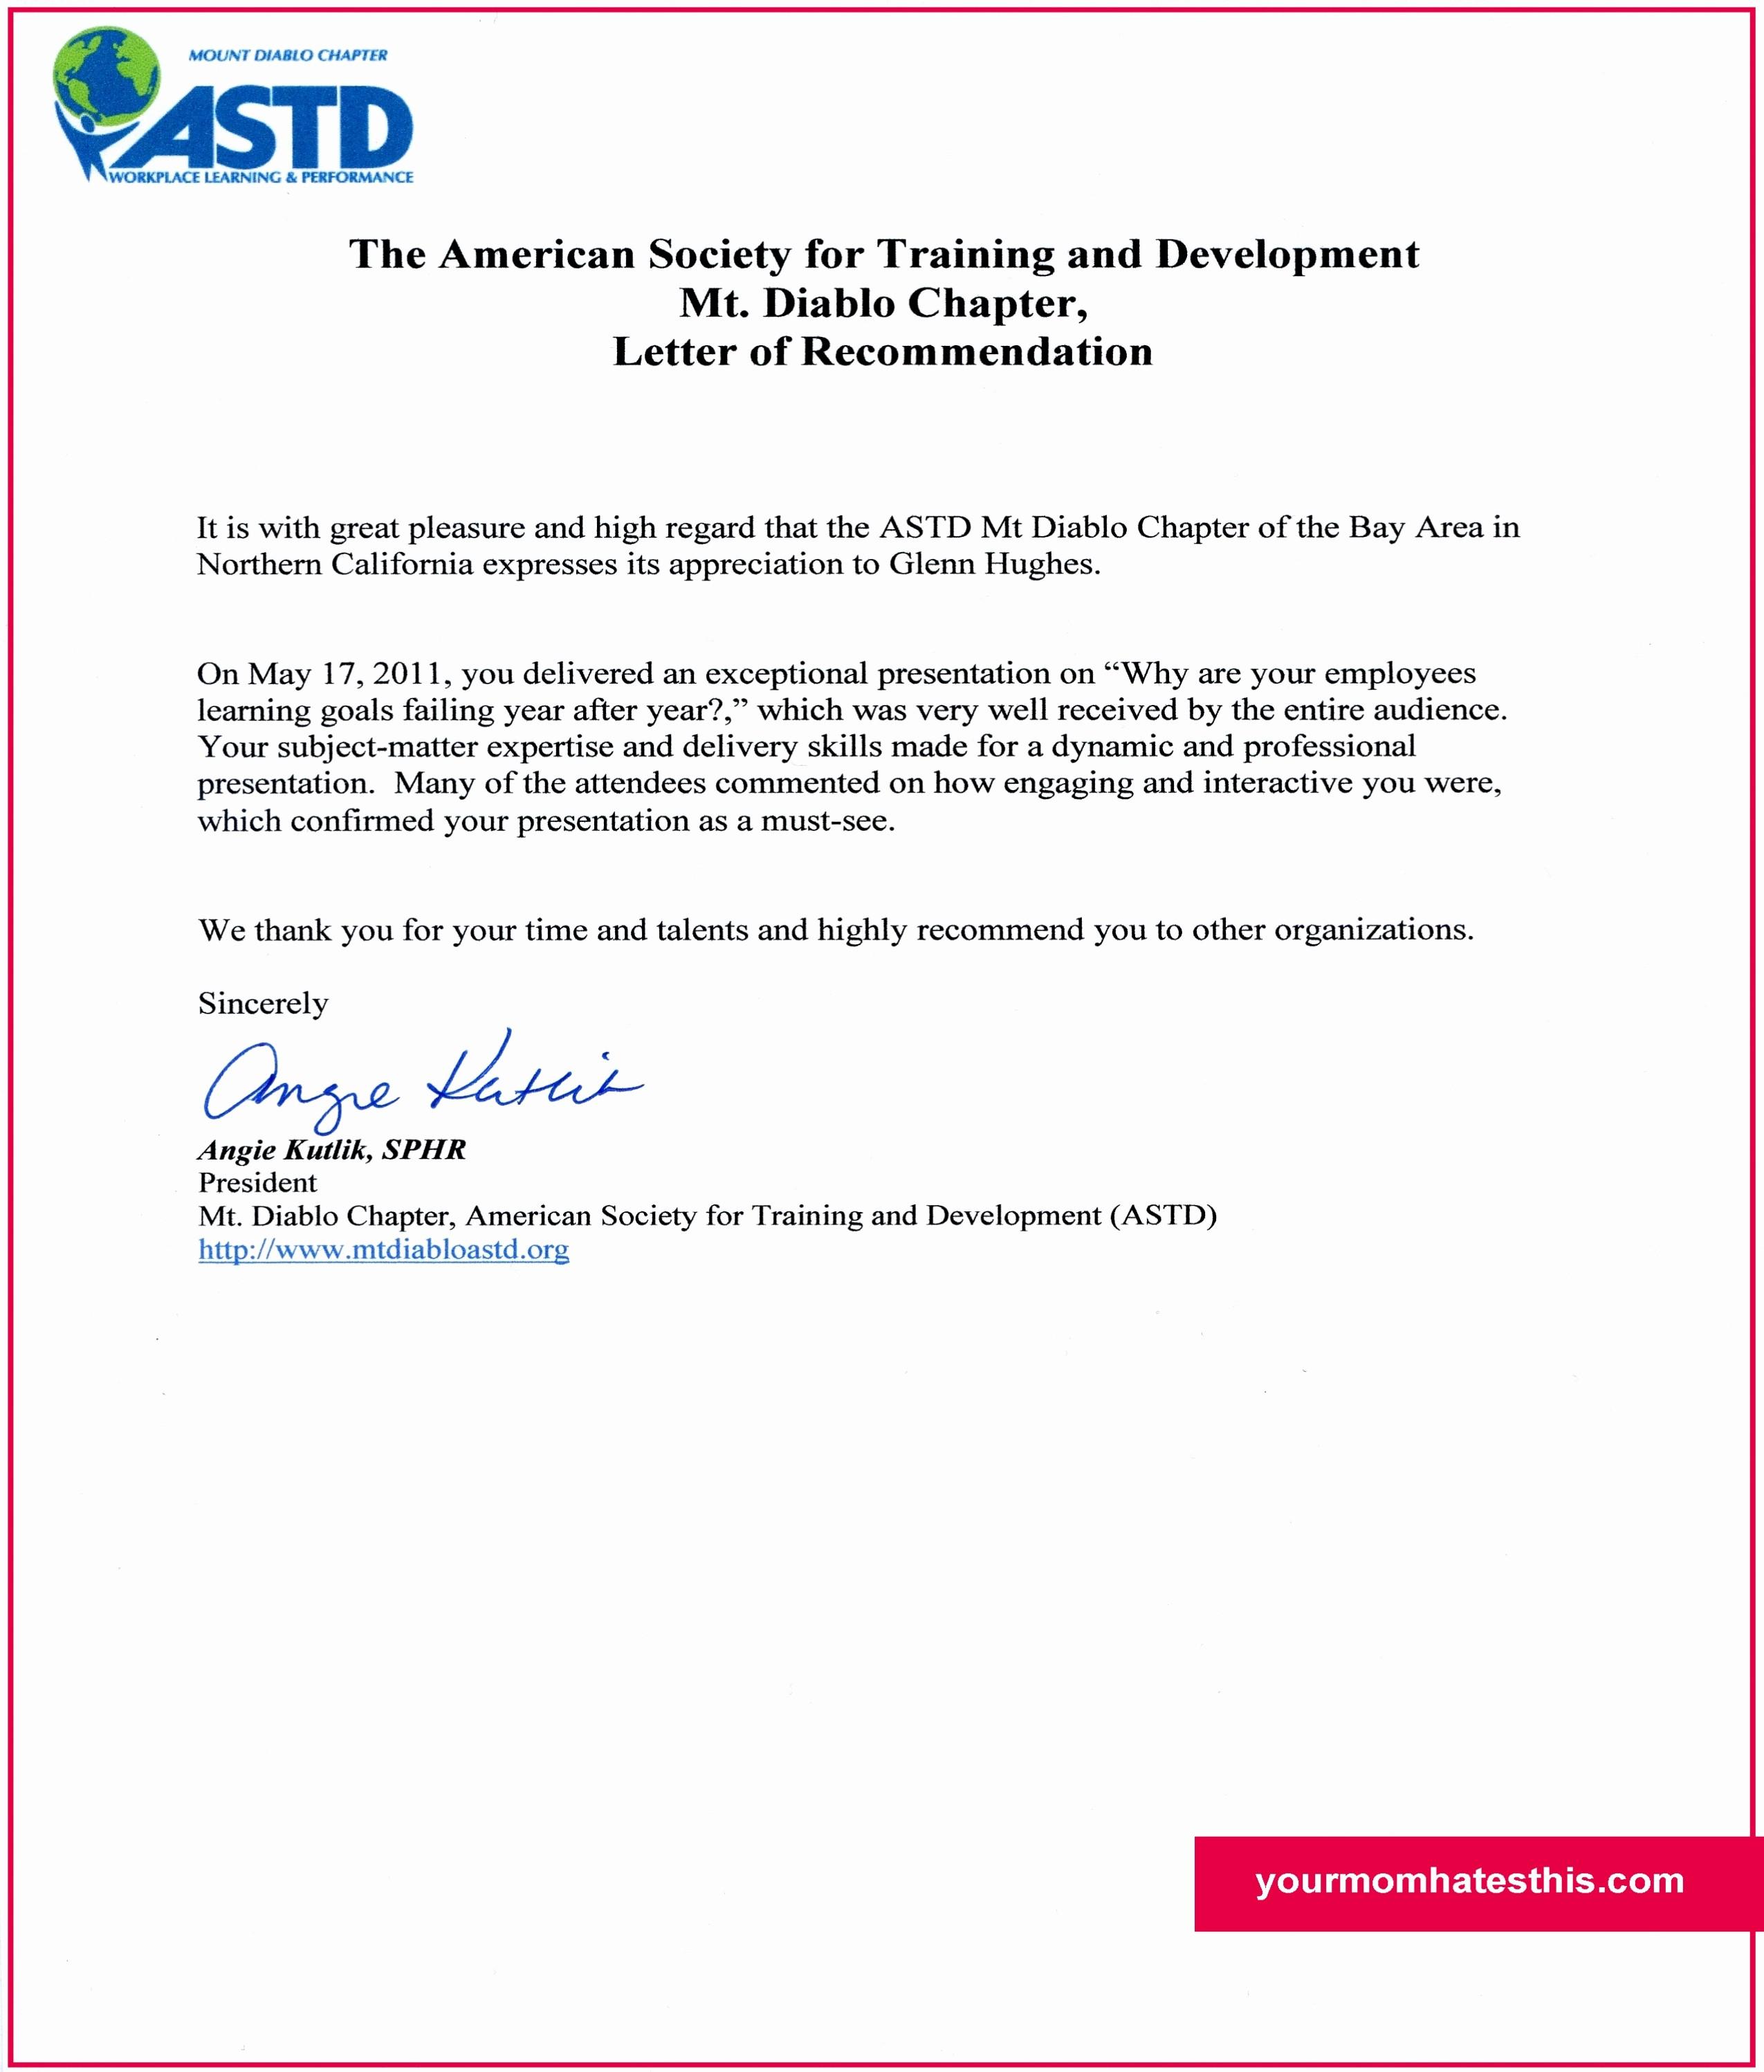 Letter Of Recommendation Employment Template Elegant Download Letter Of Re Mendation Samples